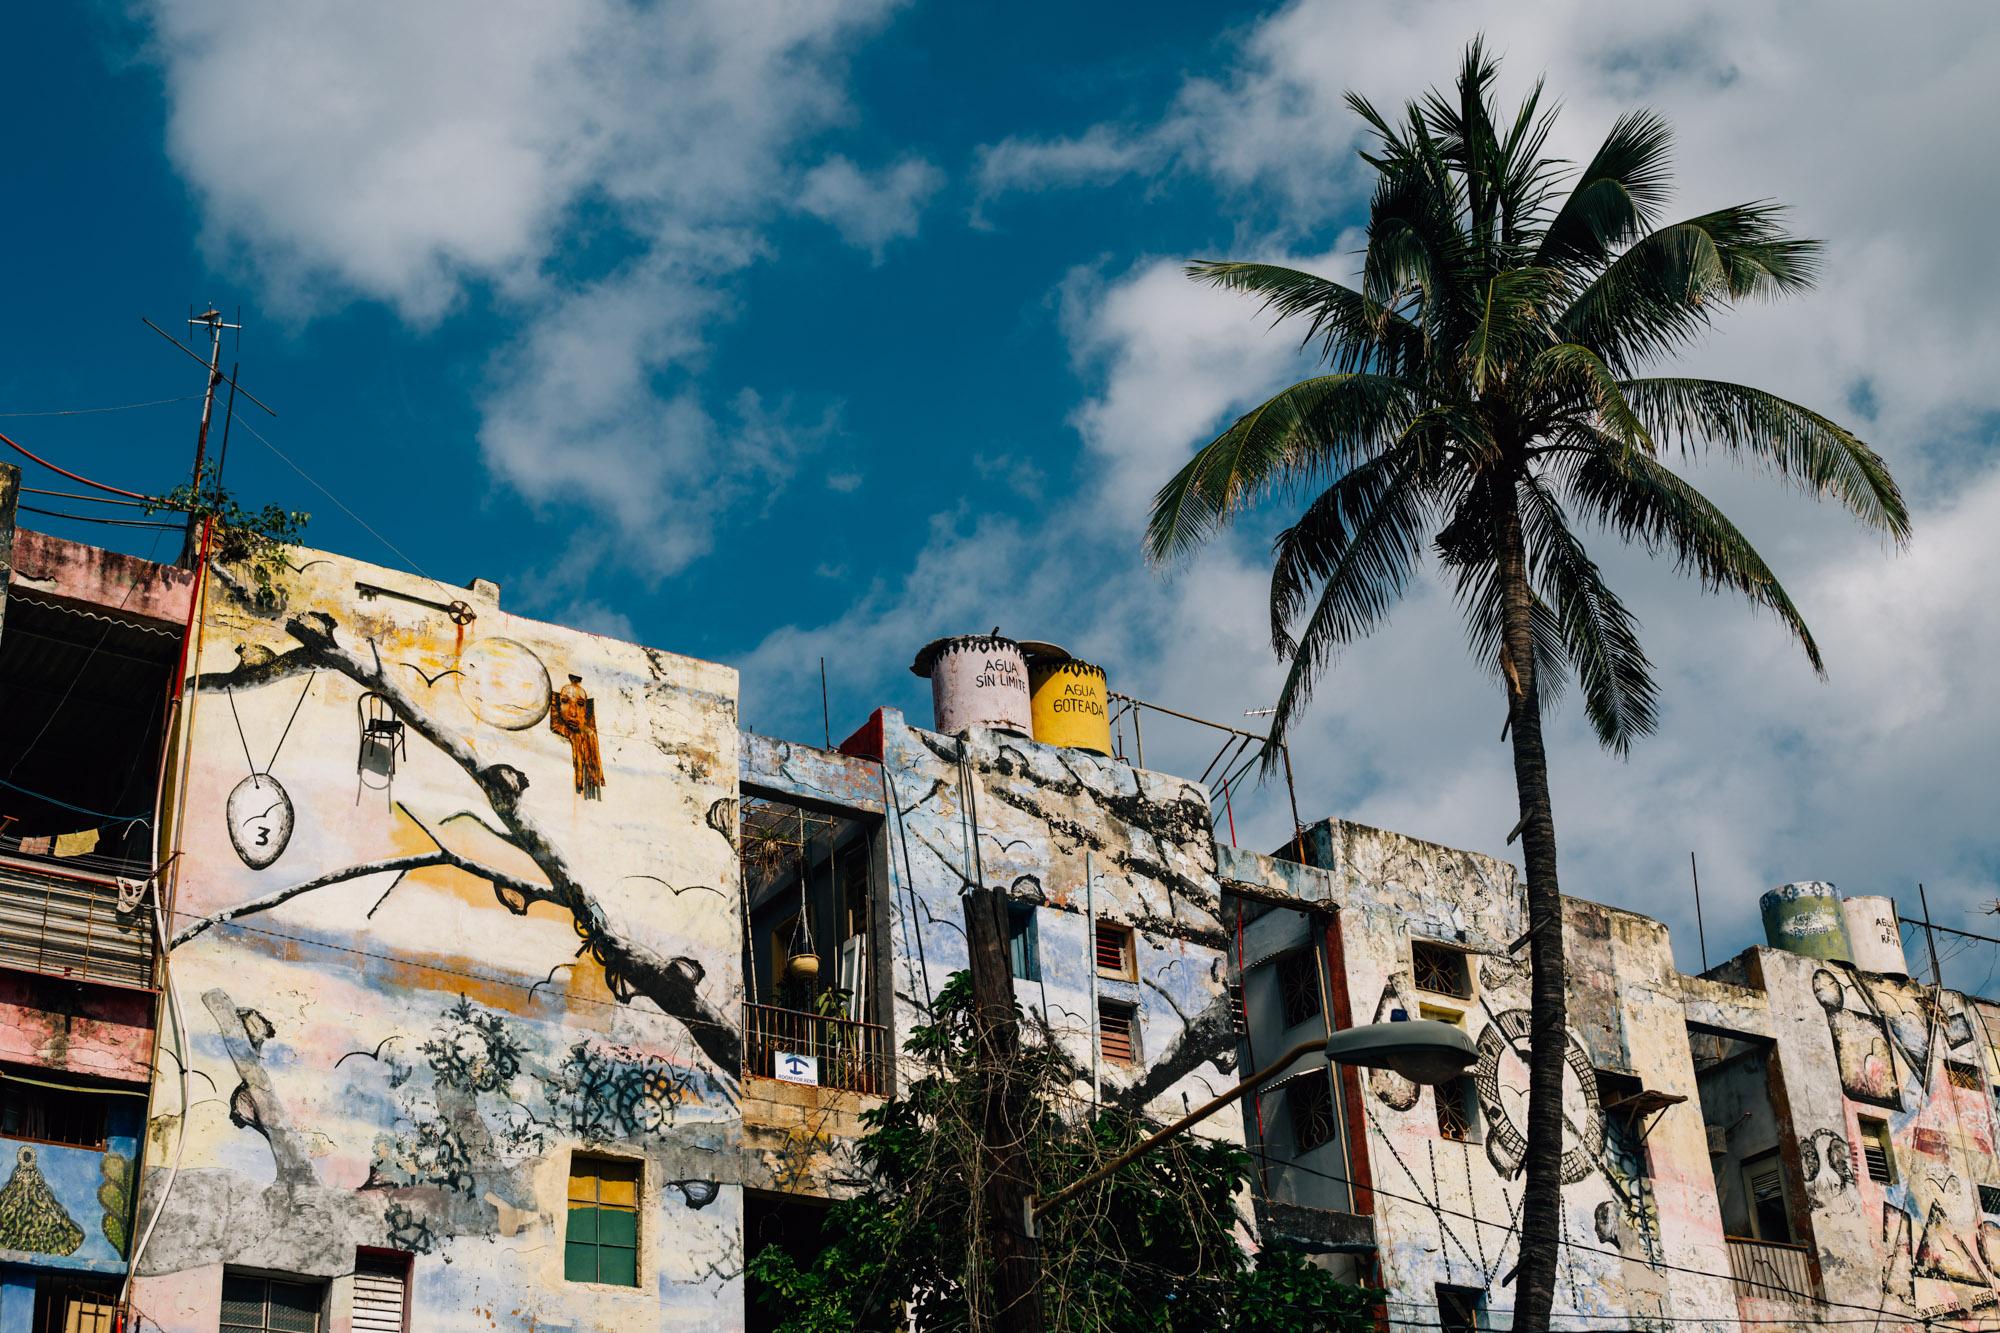 to-be-determined-photo-rhetoric-havana-cuba-177.jpg